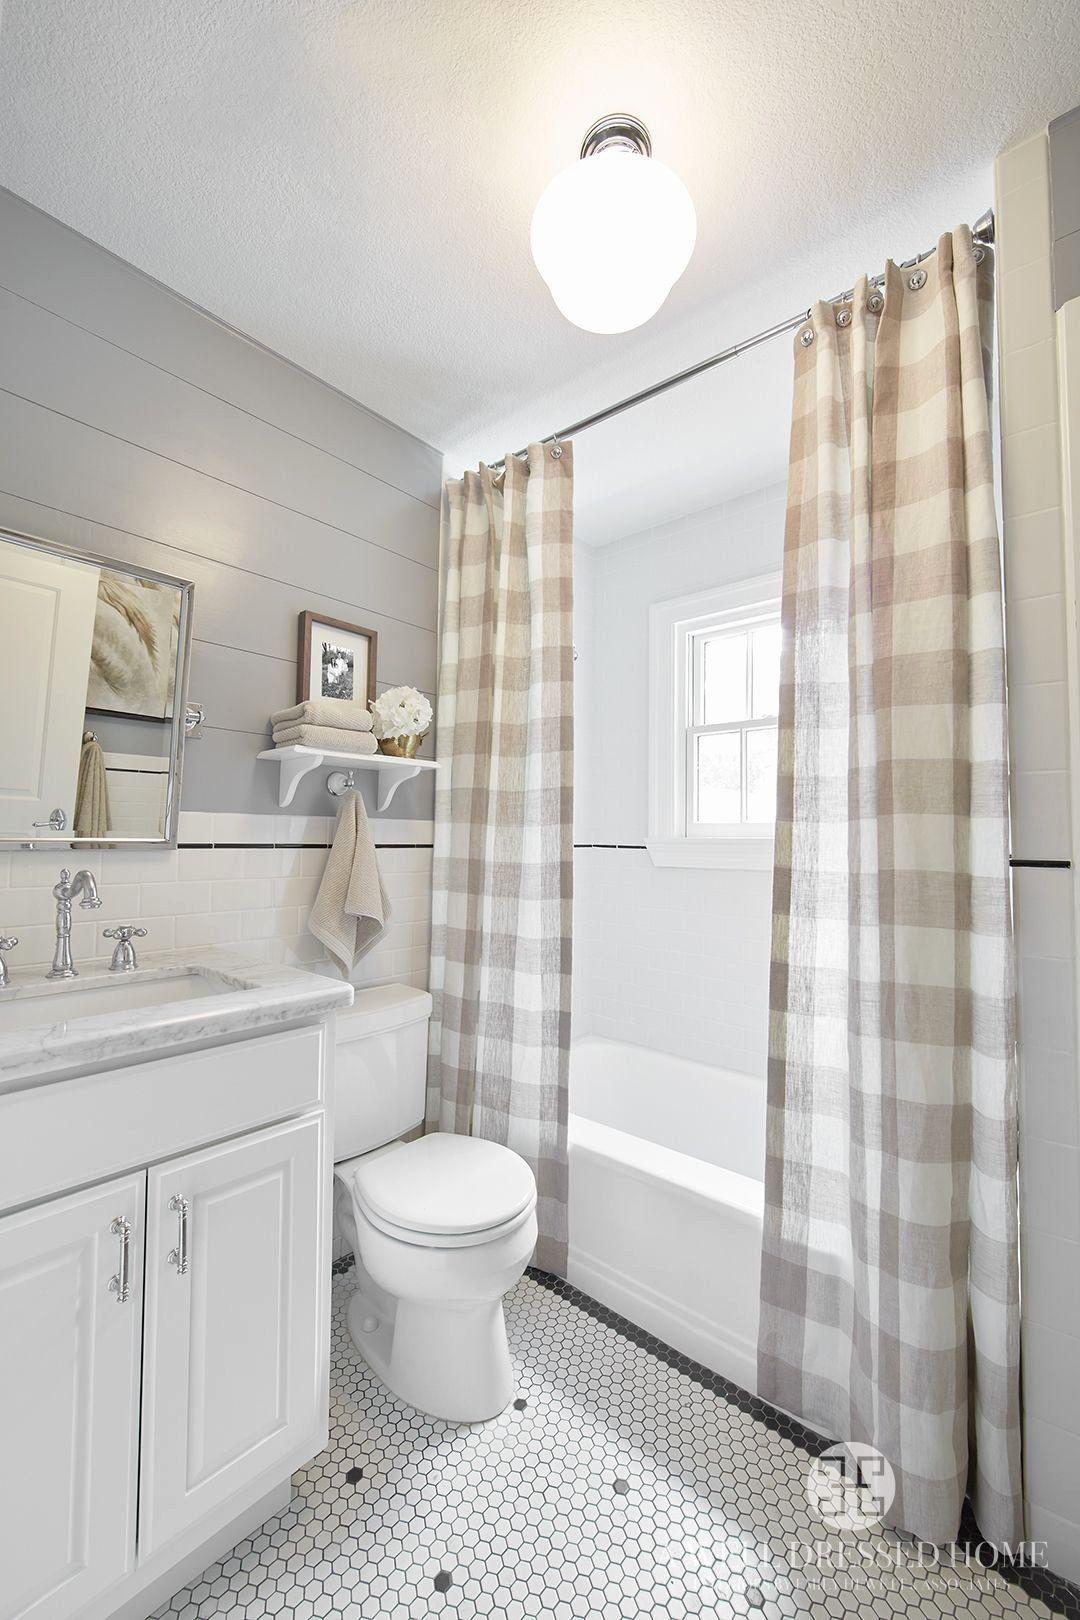 Creative Bathroom Ceiling Ideas Unique Cool Unique Floor To Ceiling Shower Curtain Ideas For S Small Bathroom Remodel Rustic Bathroom Decor Bathroom Makeover